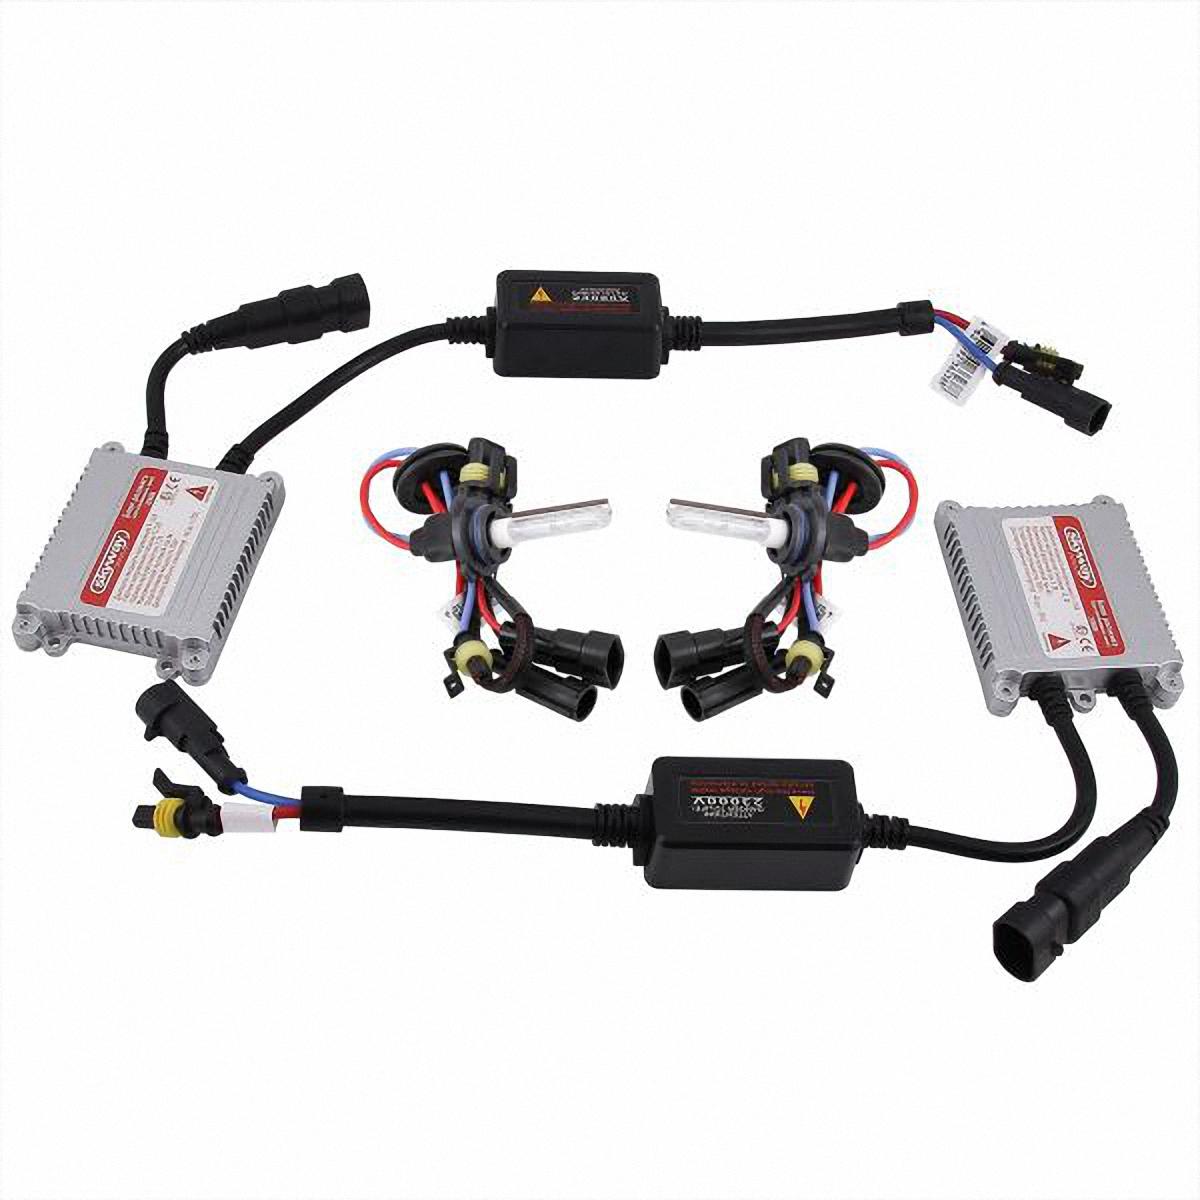 Skyway Автолампа ксенон 9006. S9006 4300K D13 12V35WS9006 4300K D13 12V35WКомплектация: Лампа газоразрядная ксеноновая – 2 шт. Блок розжига – 2шт. Винты для блока розжига – 6 шт. Гарантийный талон – 1 шт. Инструкция – 1 шт.